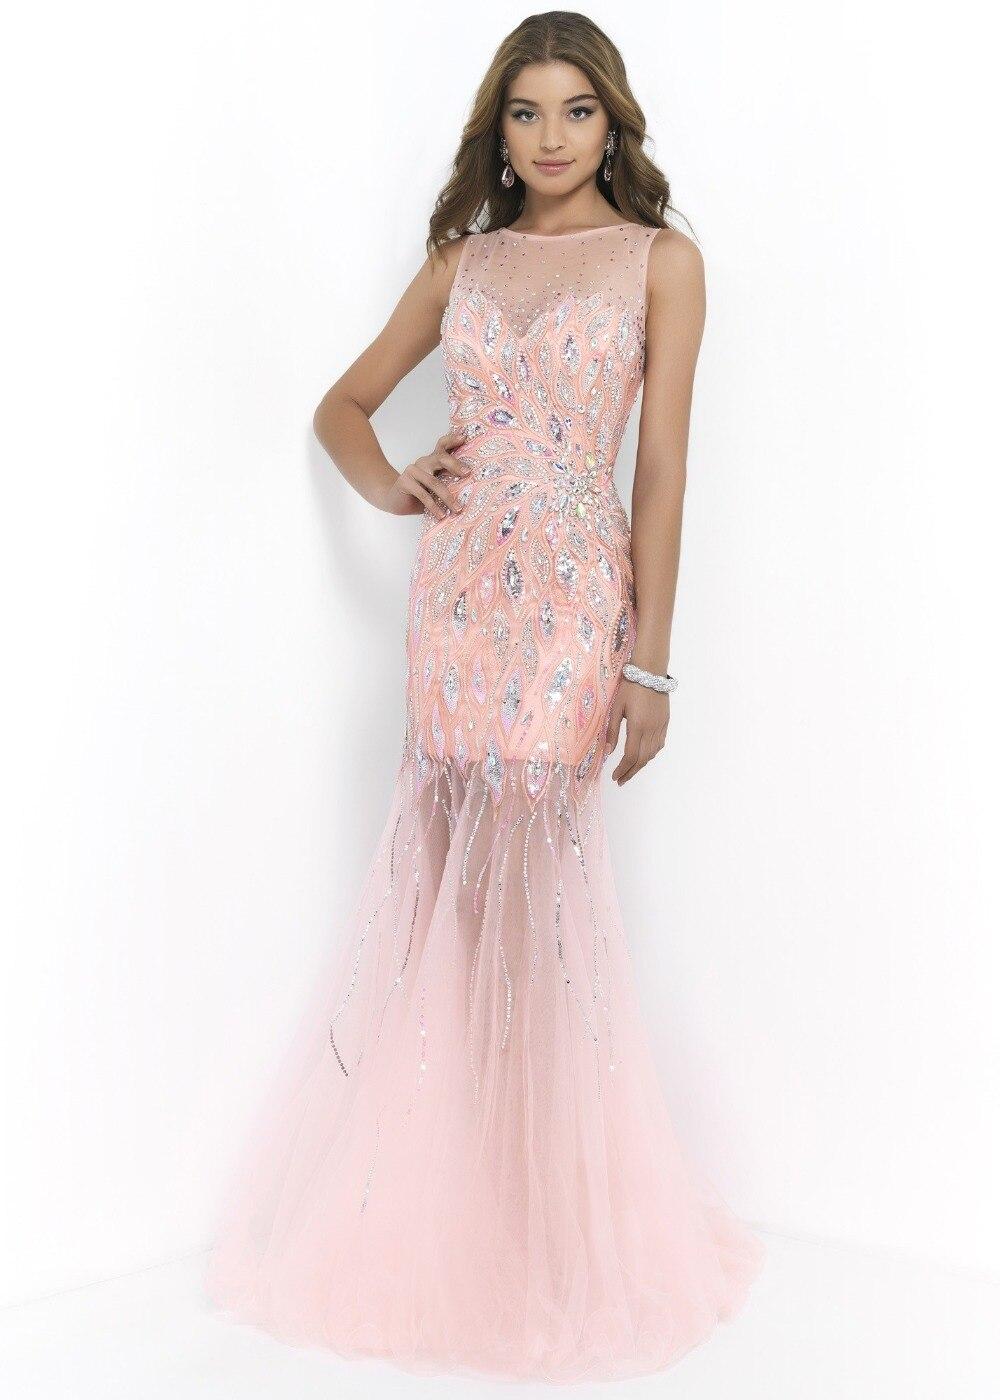 Custom Made High Quality Chic Beaded Pink Mermaid Prom Dress Plus